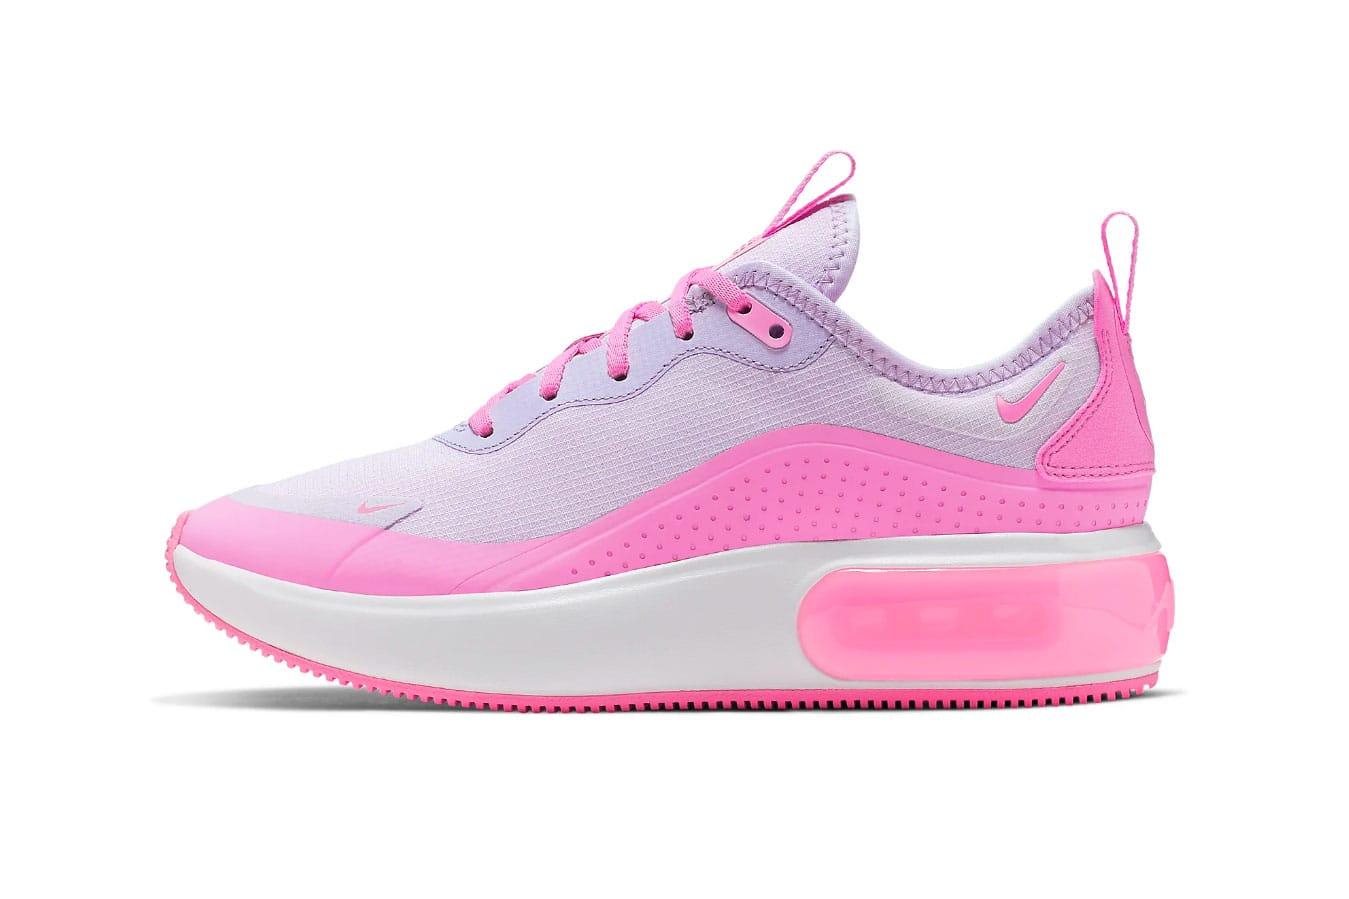 Air Max Dia in Pink Amethyst Tint